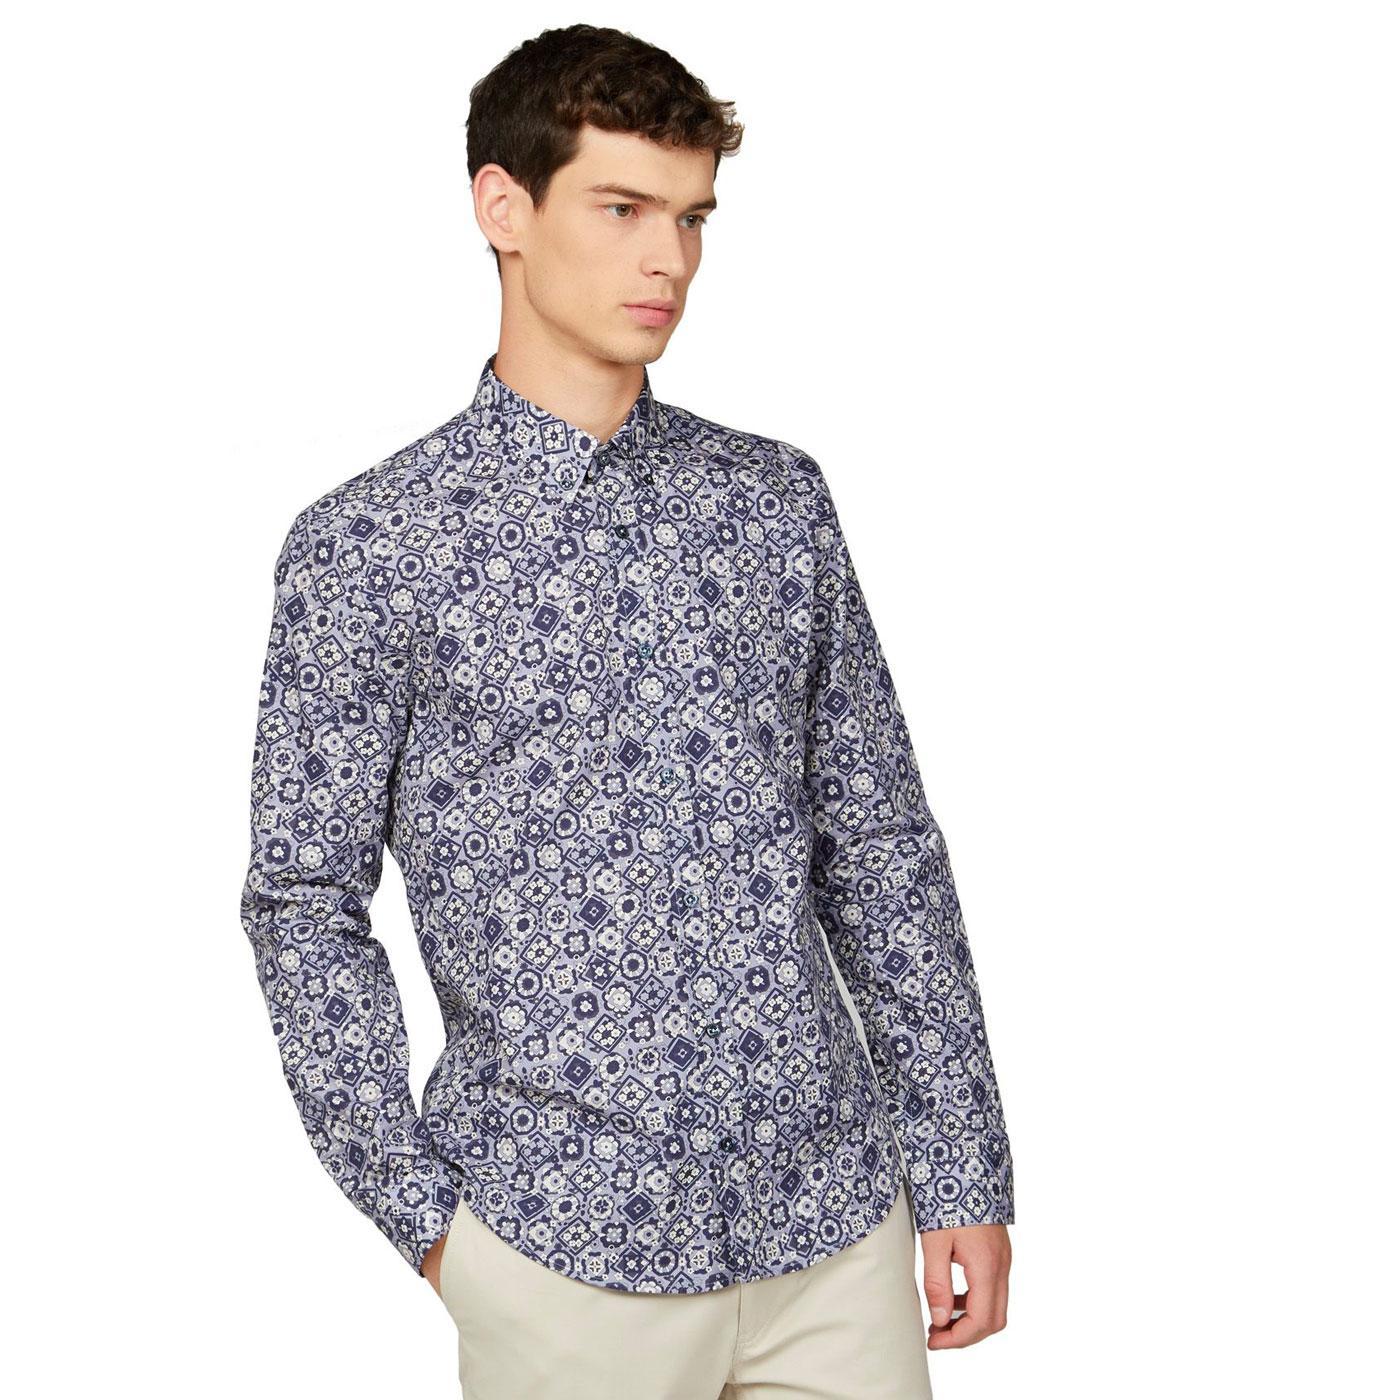 BEN SHERMAN Retro 60s Foulard Print Shirt - Violet